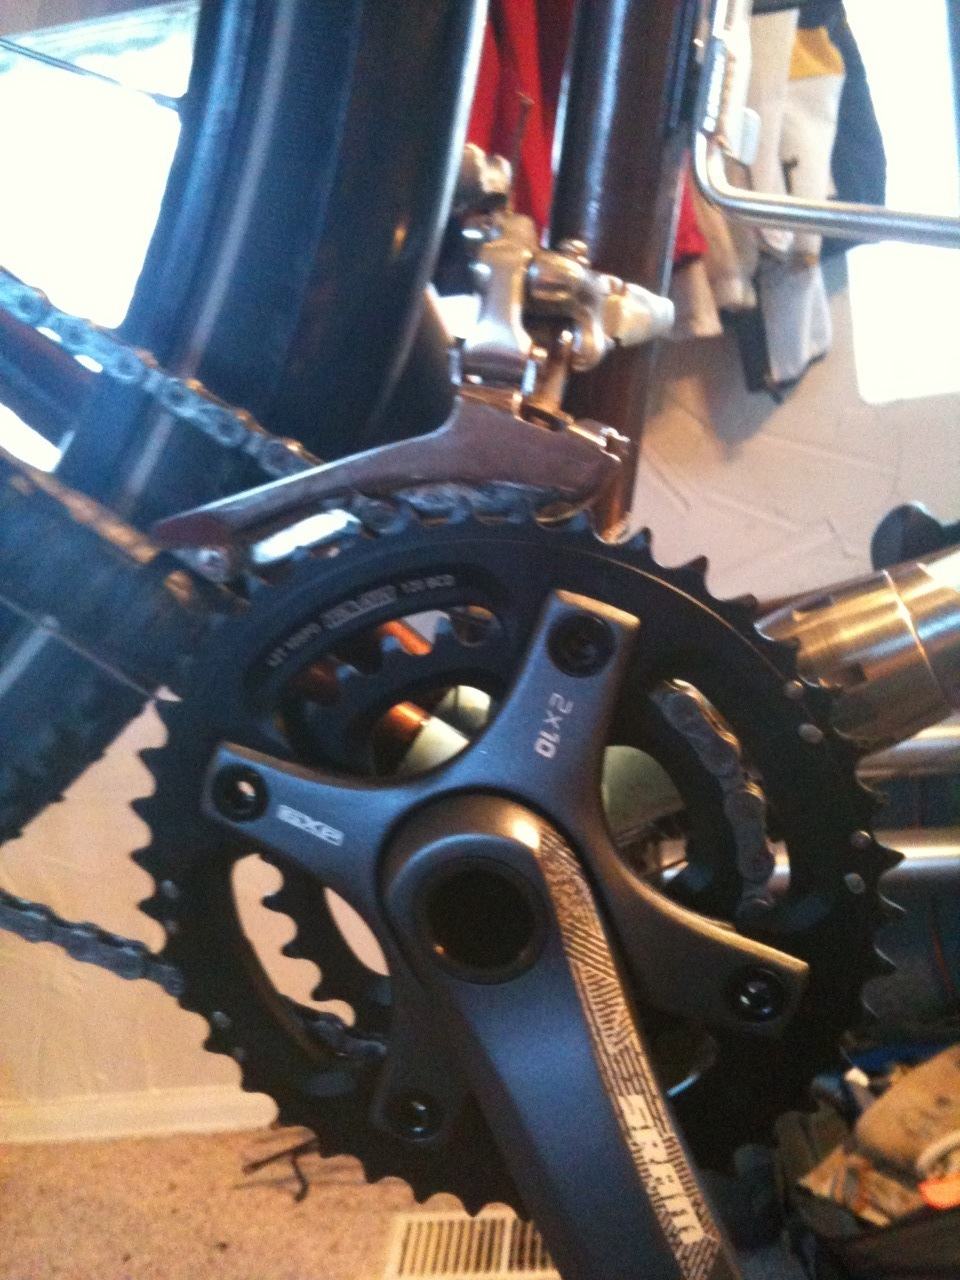 2x10 Crank with 9 speed setup-vaya-2x10-sram-crankset.jpg